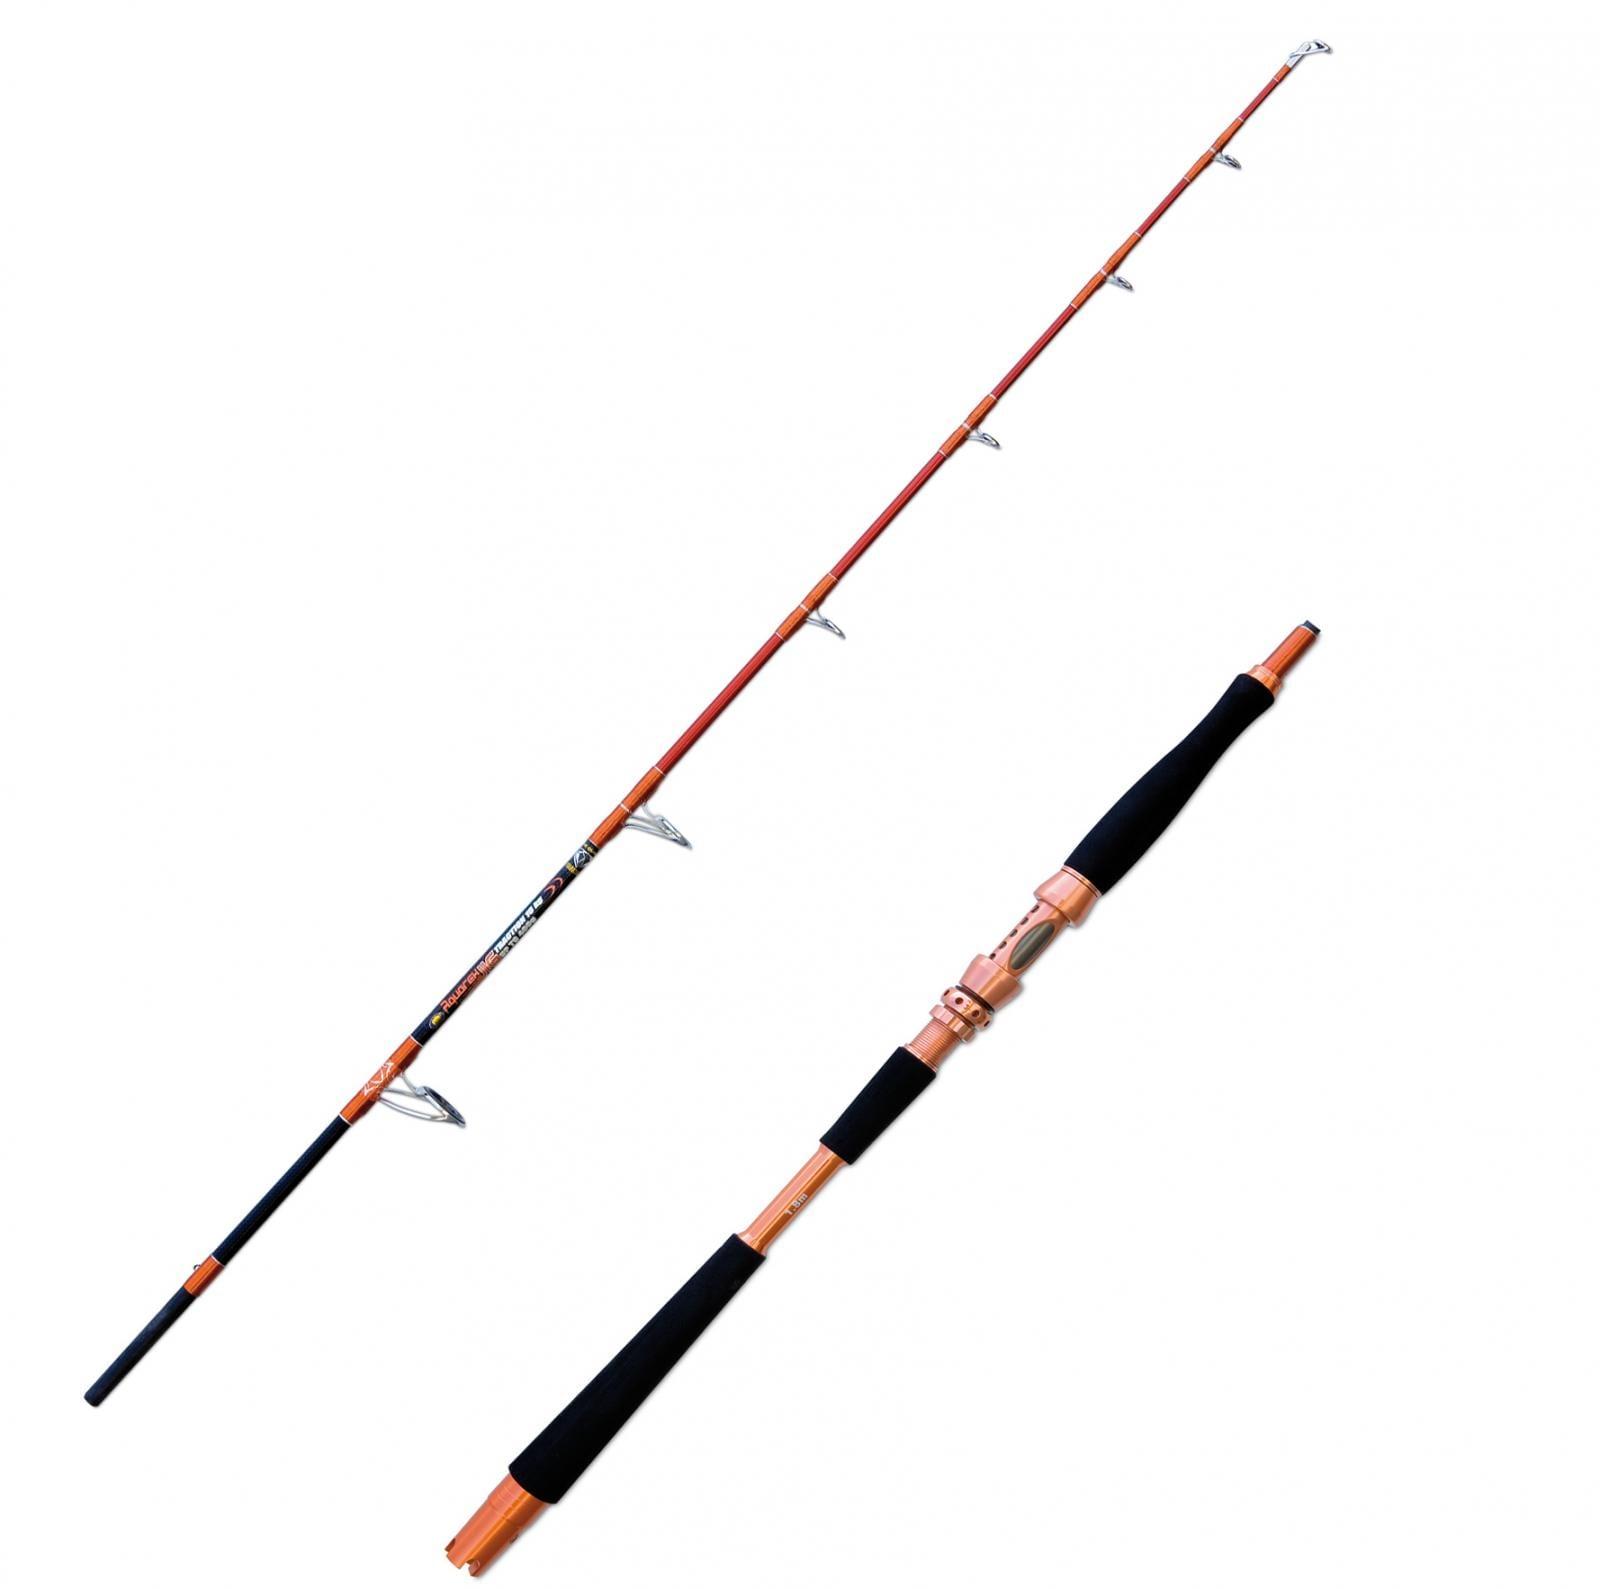 Lineaeffe Aquarex Jig Traction 15kg, 180cm-6′